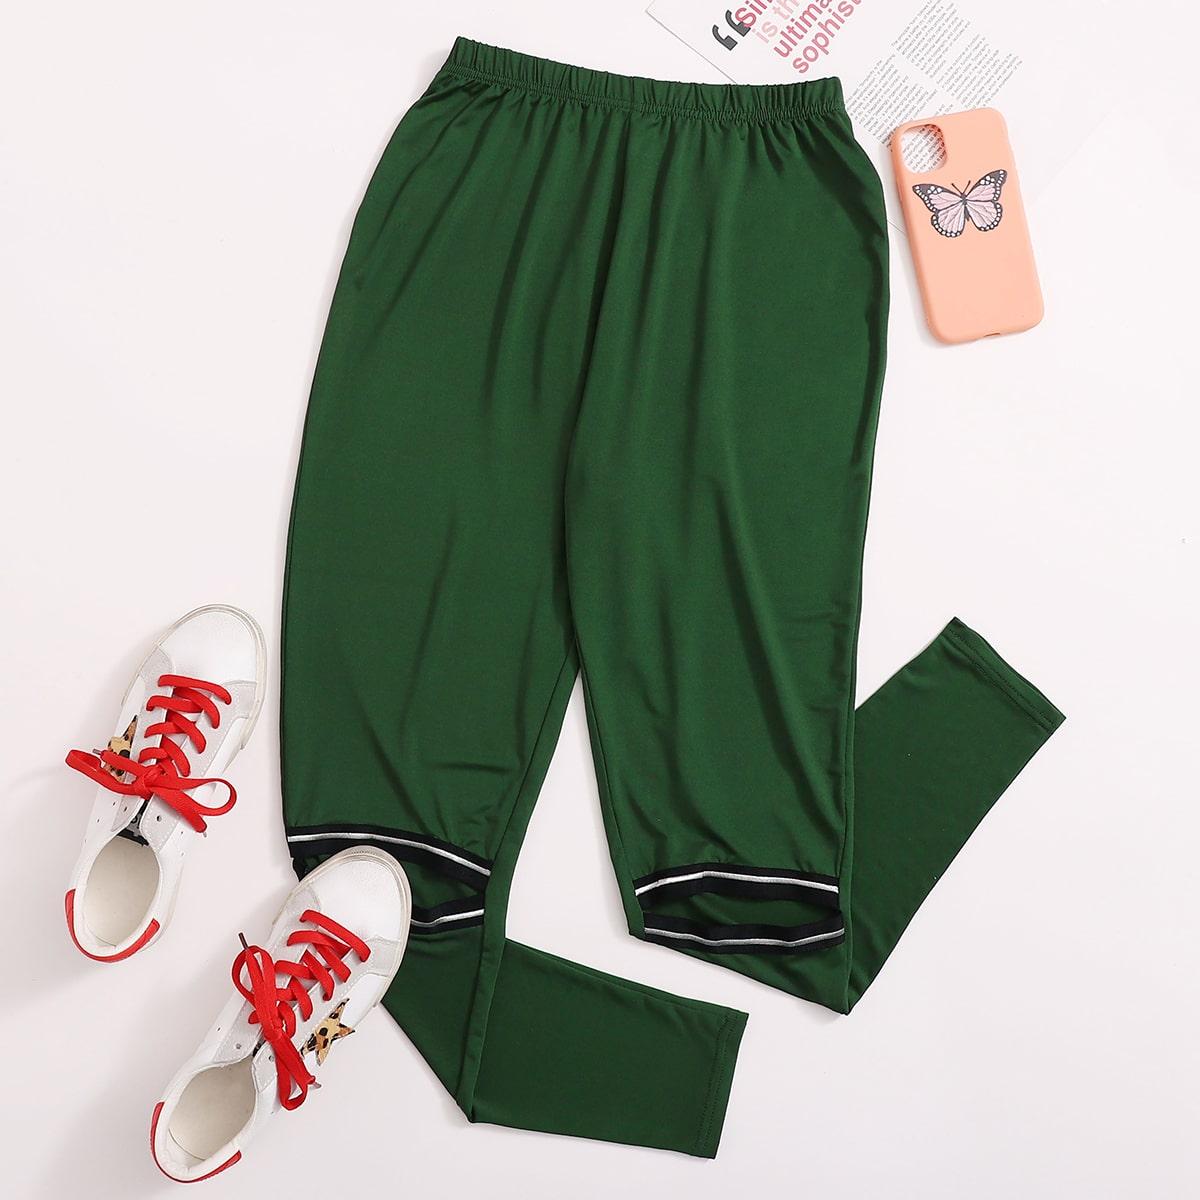 SHEIN / Leggings Cinta A rayas Verde Deportivo